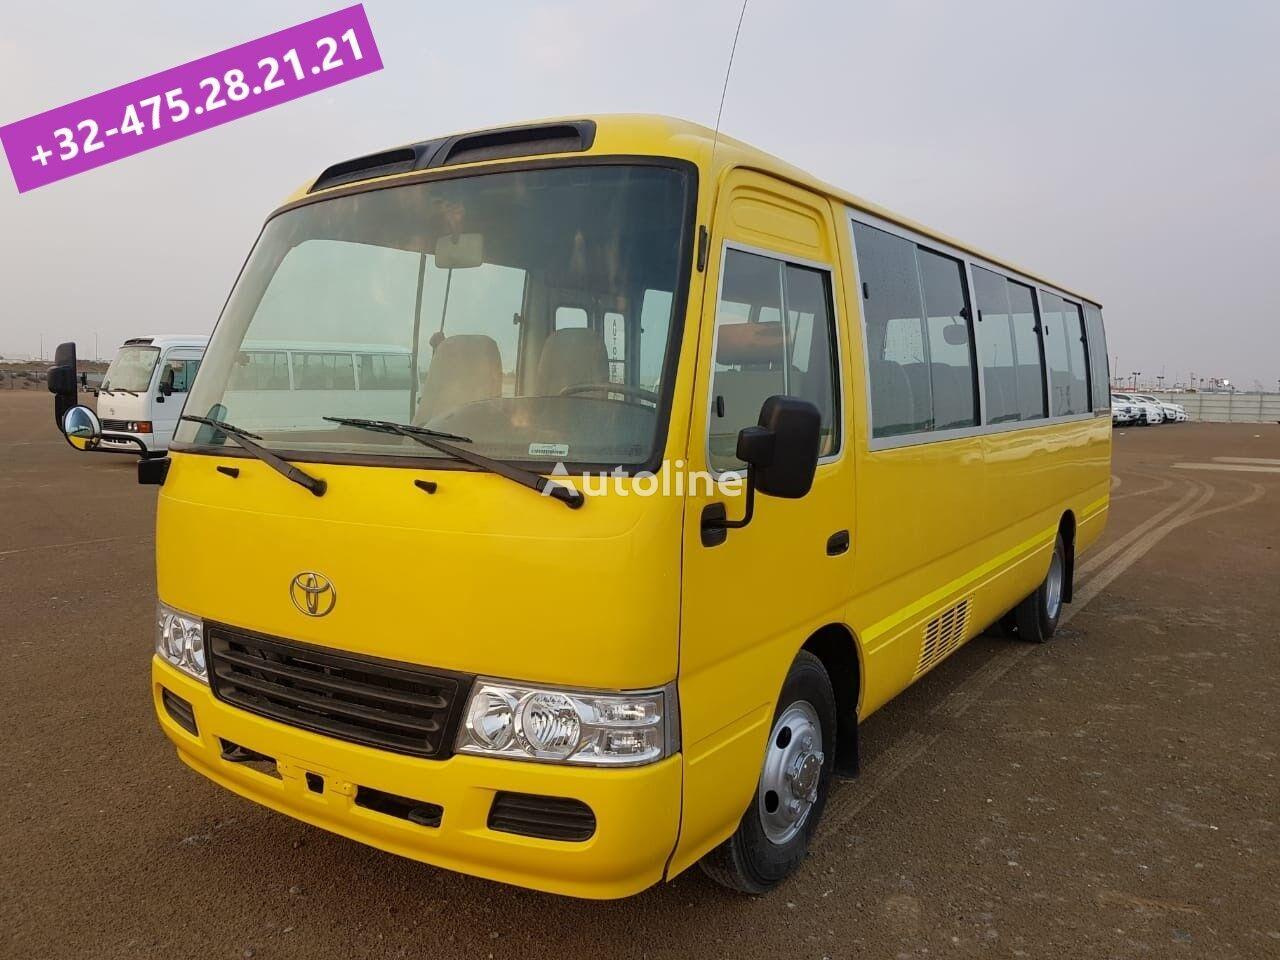 TOYOTA Coaster ... Japan made - Bus pas chinois ......BELGIUM... passenger van